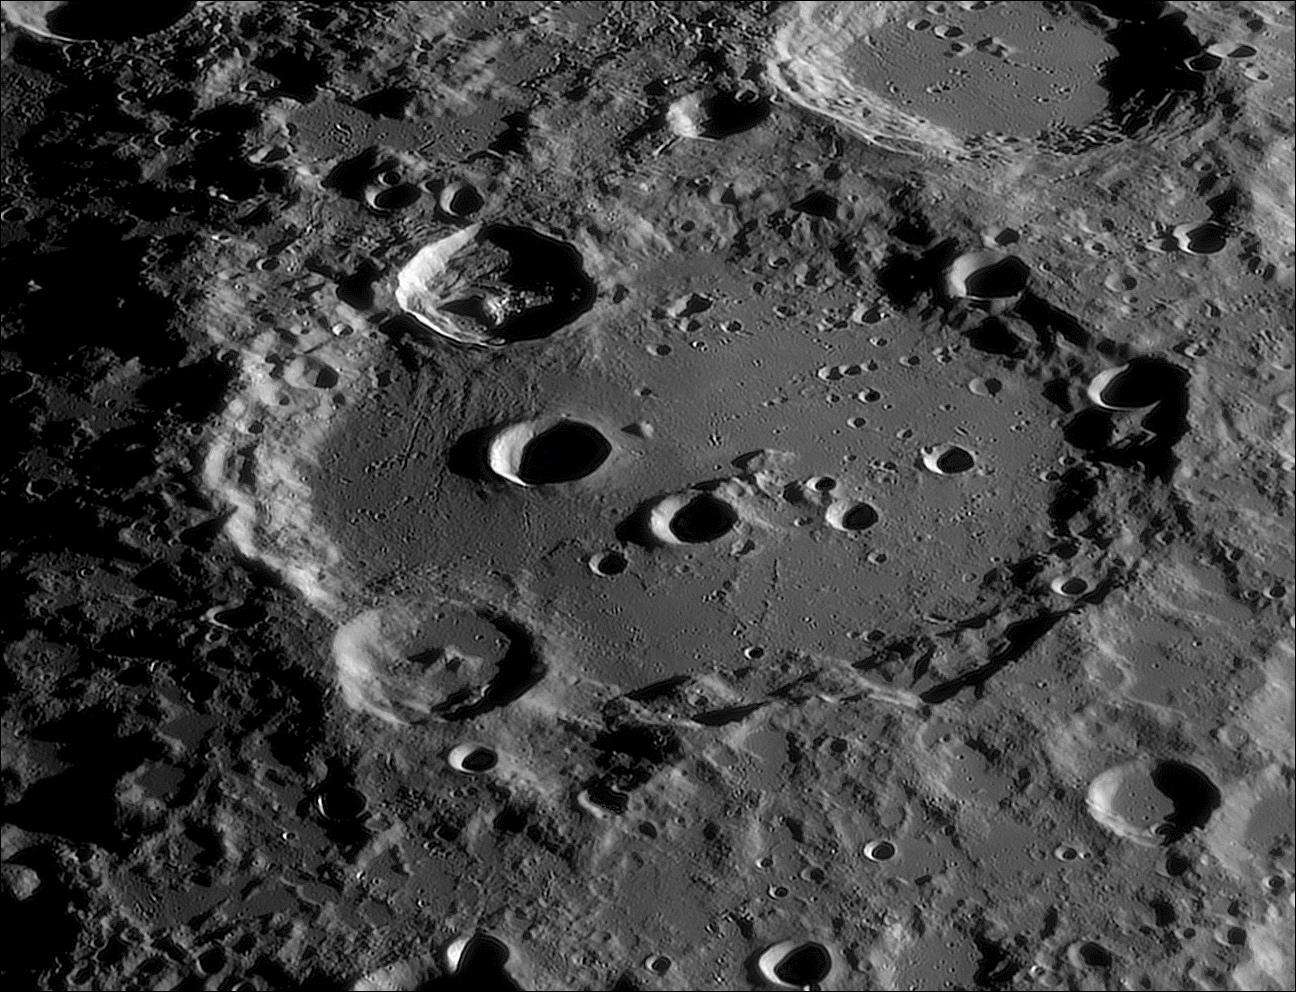 La Lune 650 images MF et PH BV CA.jpg